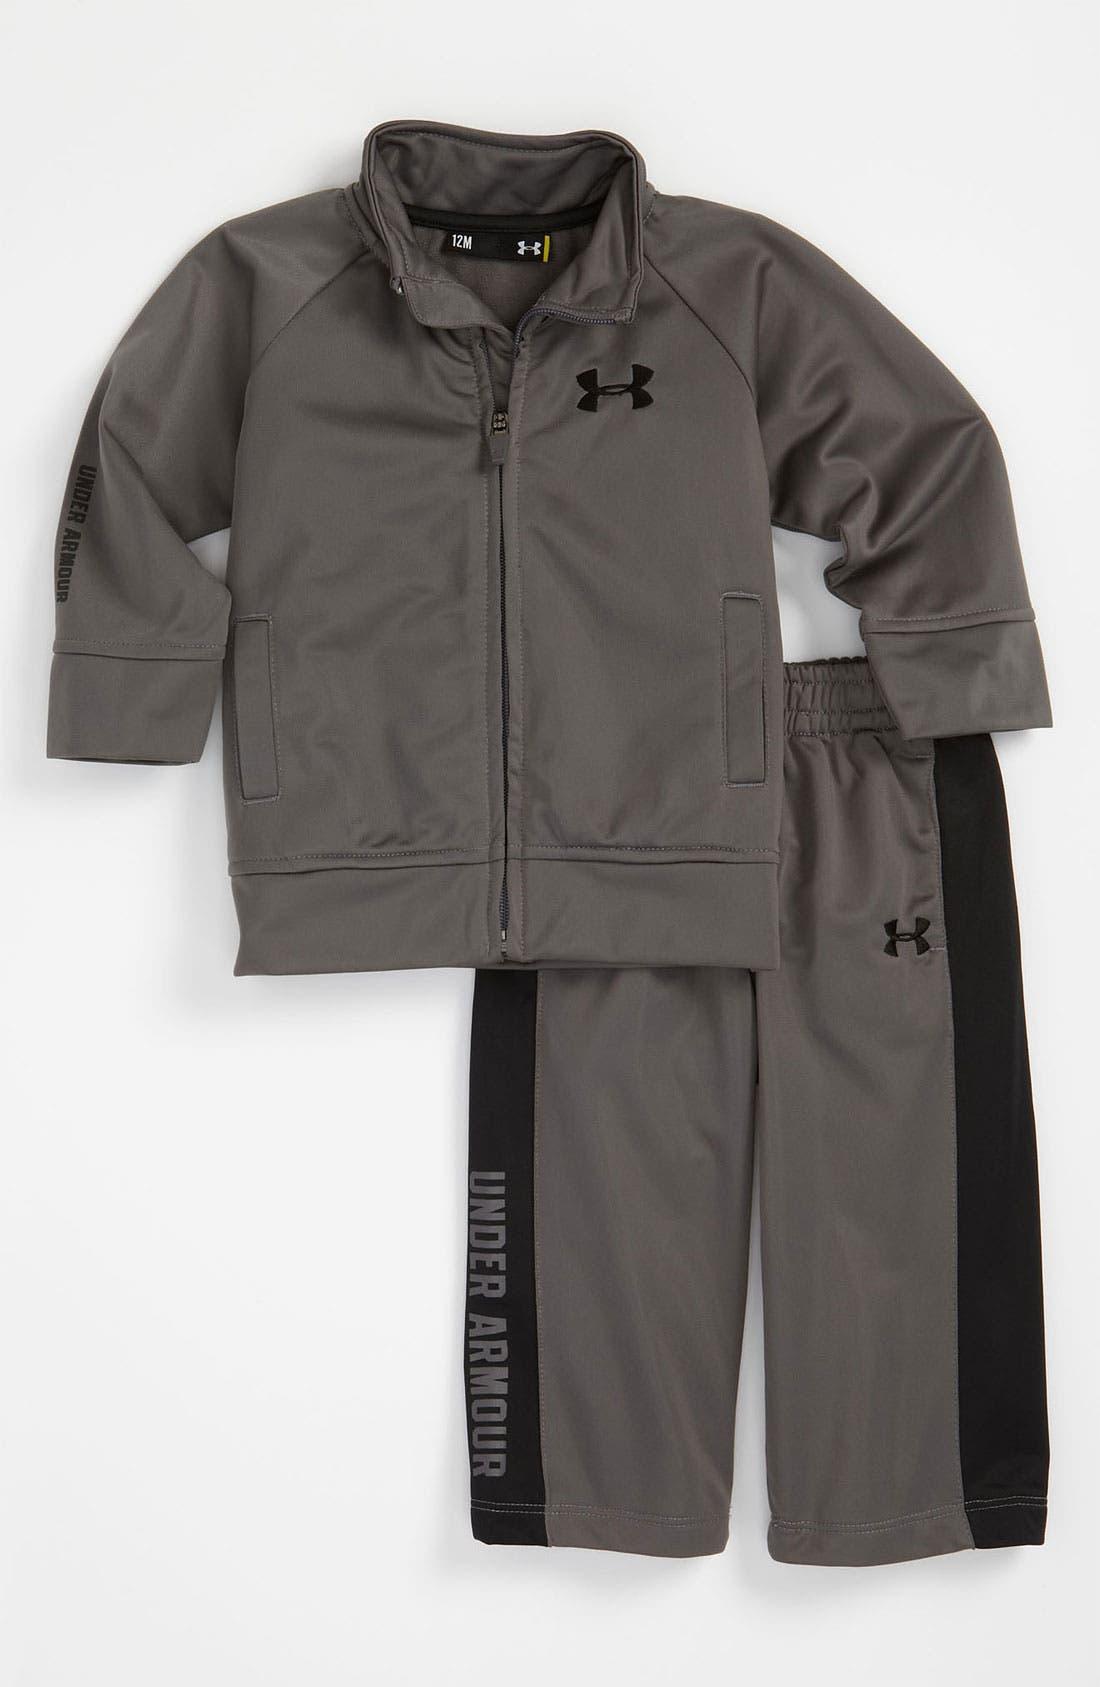 Main Image - Under Armour Jacket & Pants (Infant)